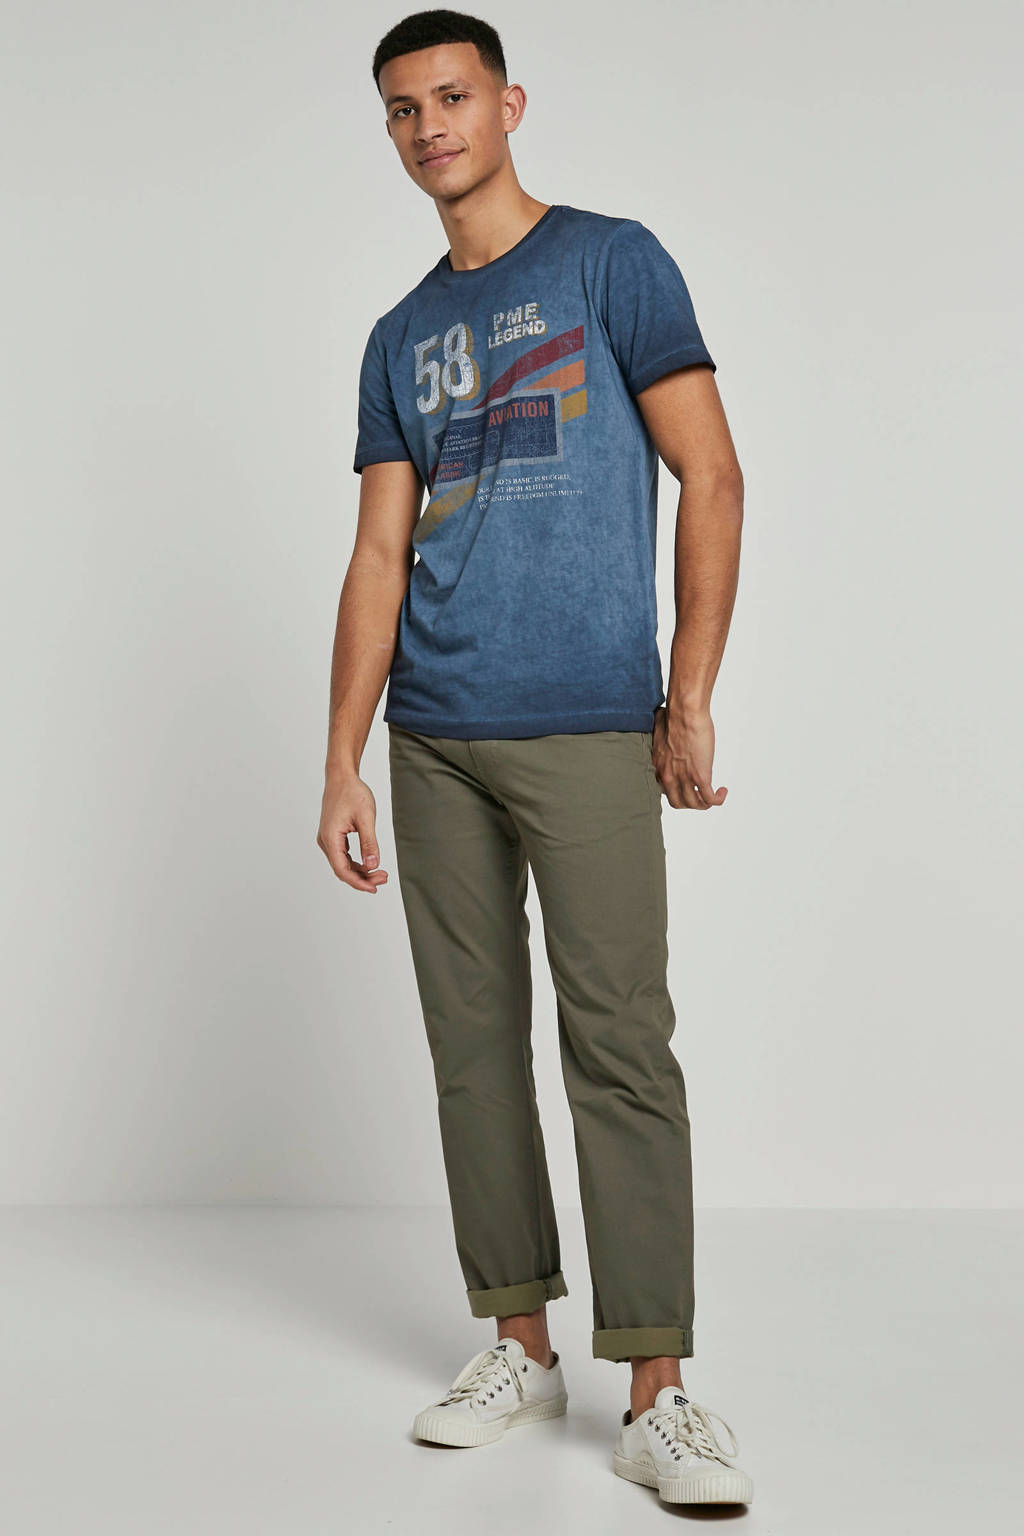 PME Legend T-shirt, Blauw